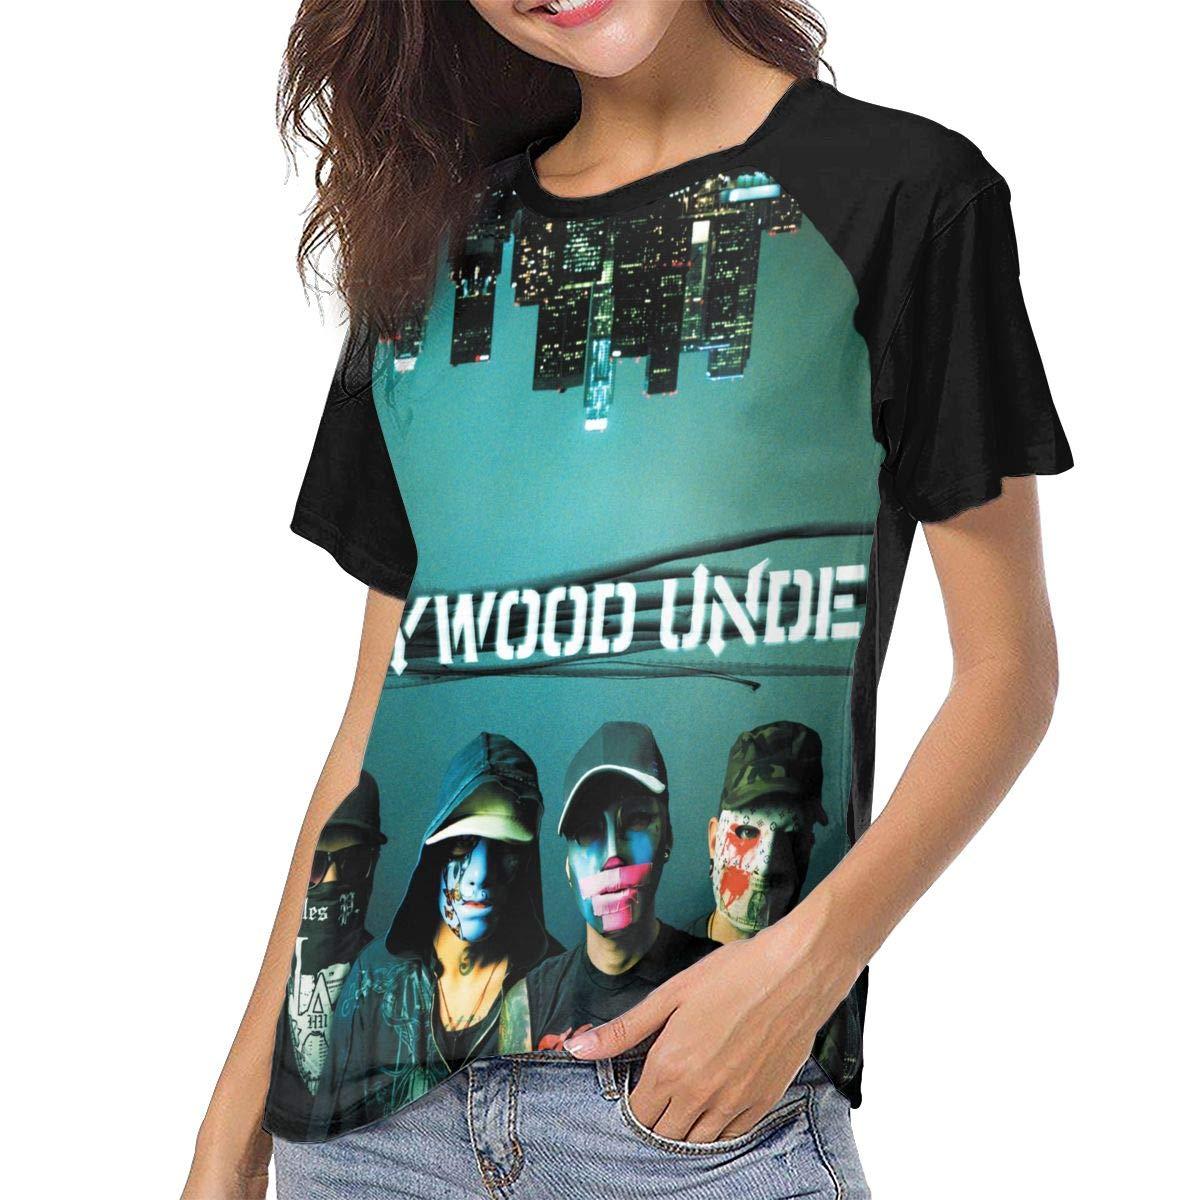 StephaDHampton Hollywood Undead Womens Casual Baseball Short Sleeves Tshirts Raglan Sleeve Pattern T Shirts Black